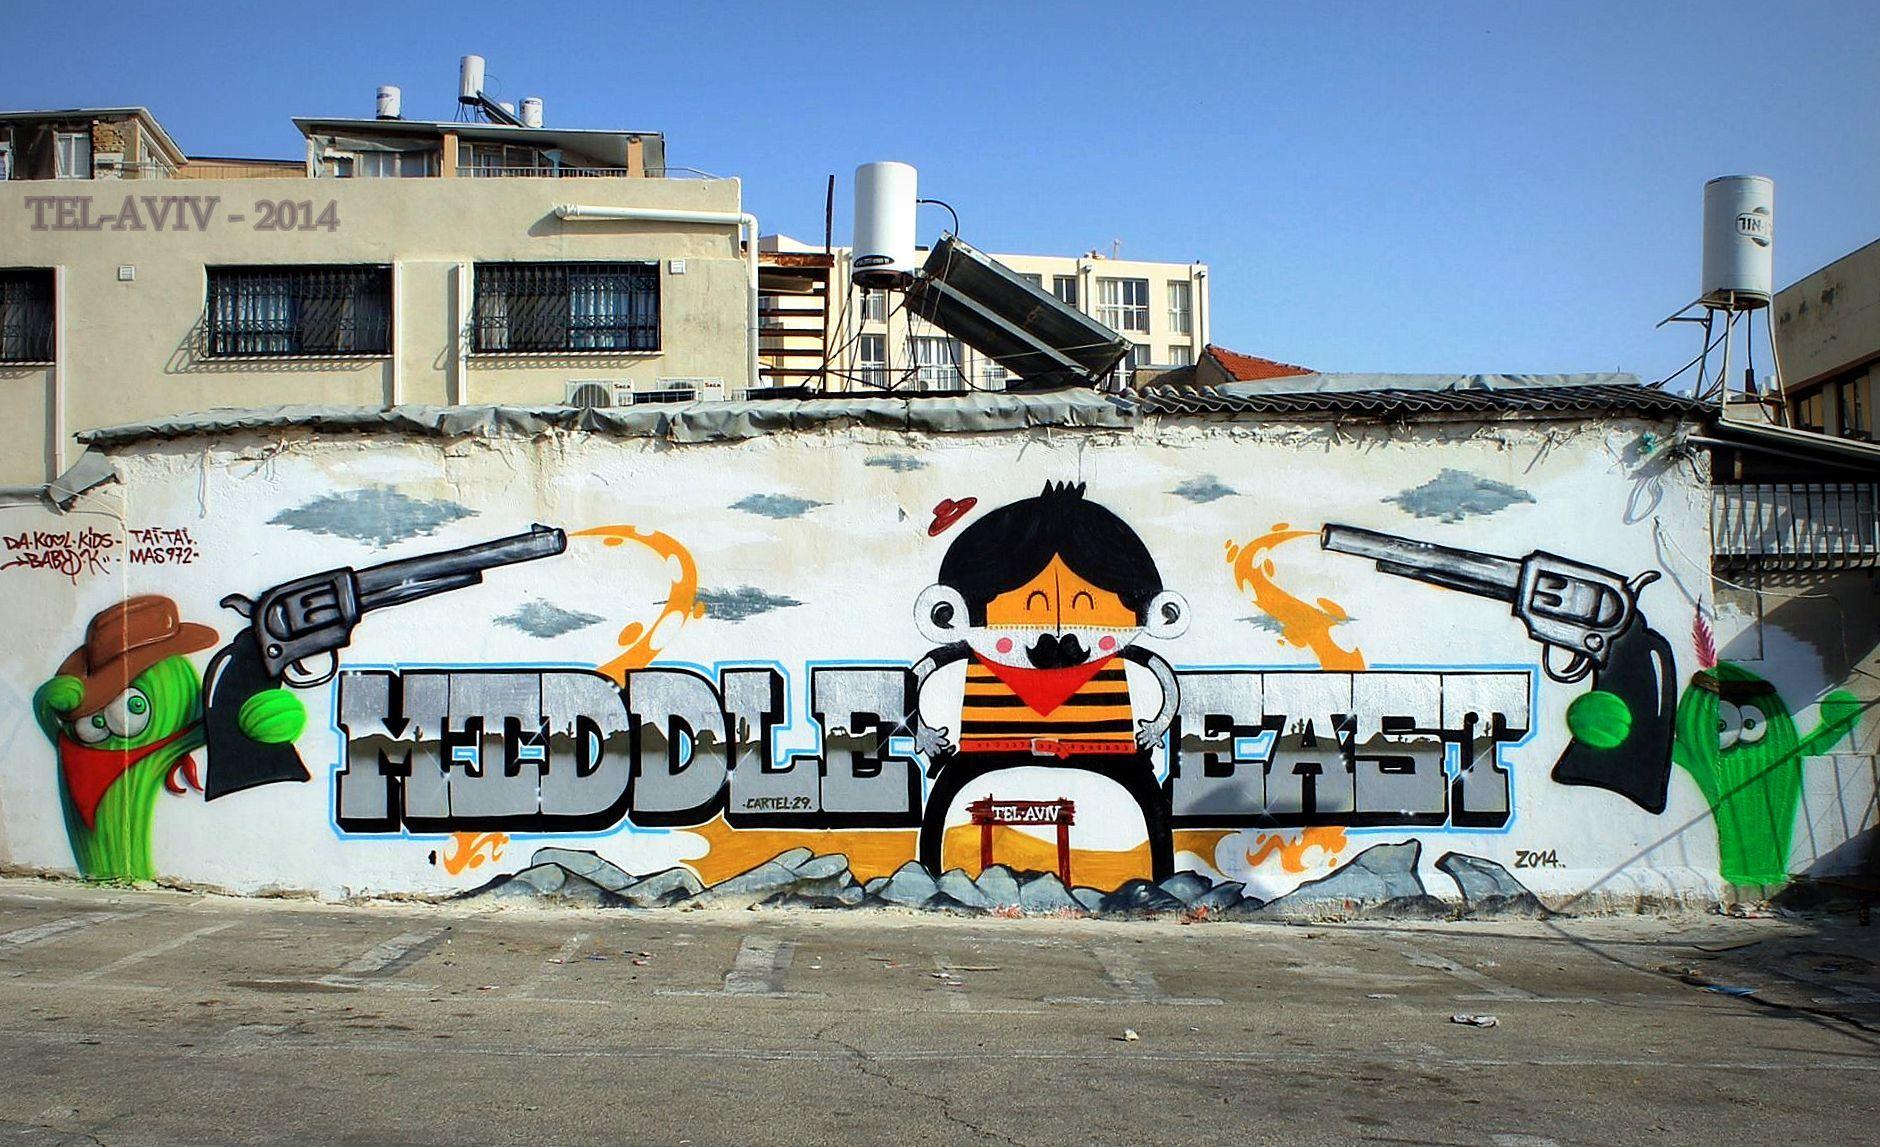 Tel Aviv 2014 Feat Mas and Dakoolkids